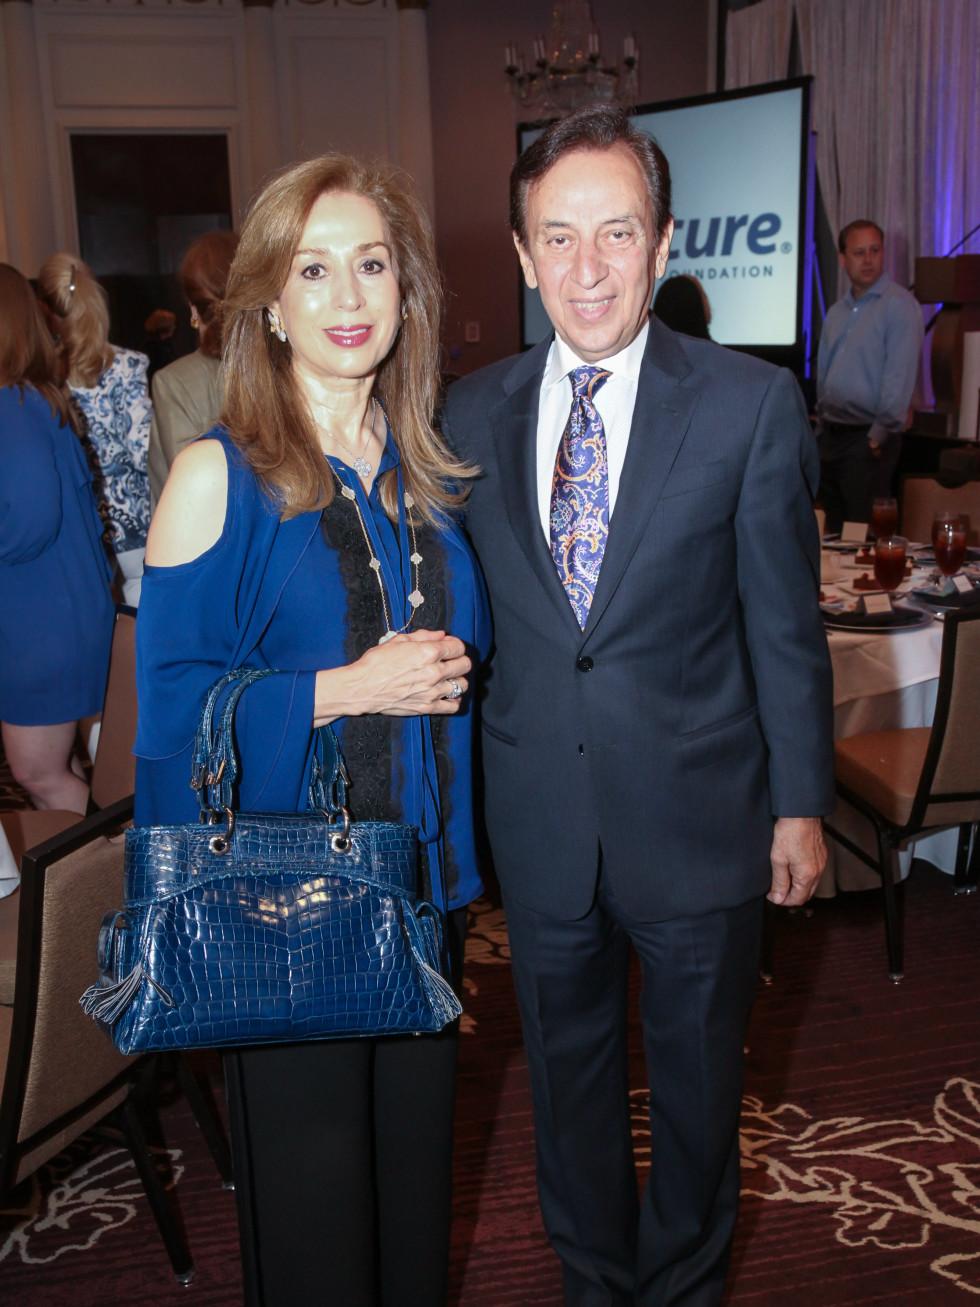 Blue Cure Roya and Massoud Taghdisi